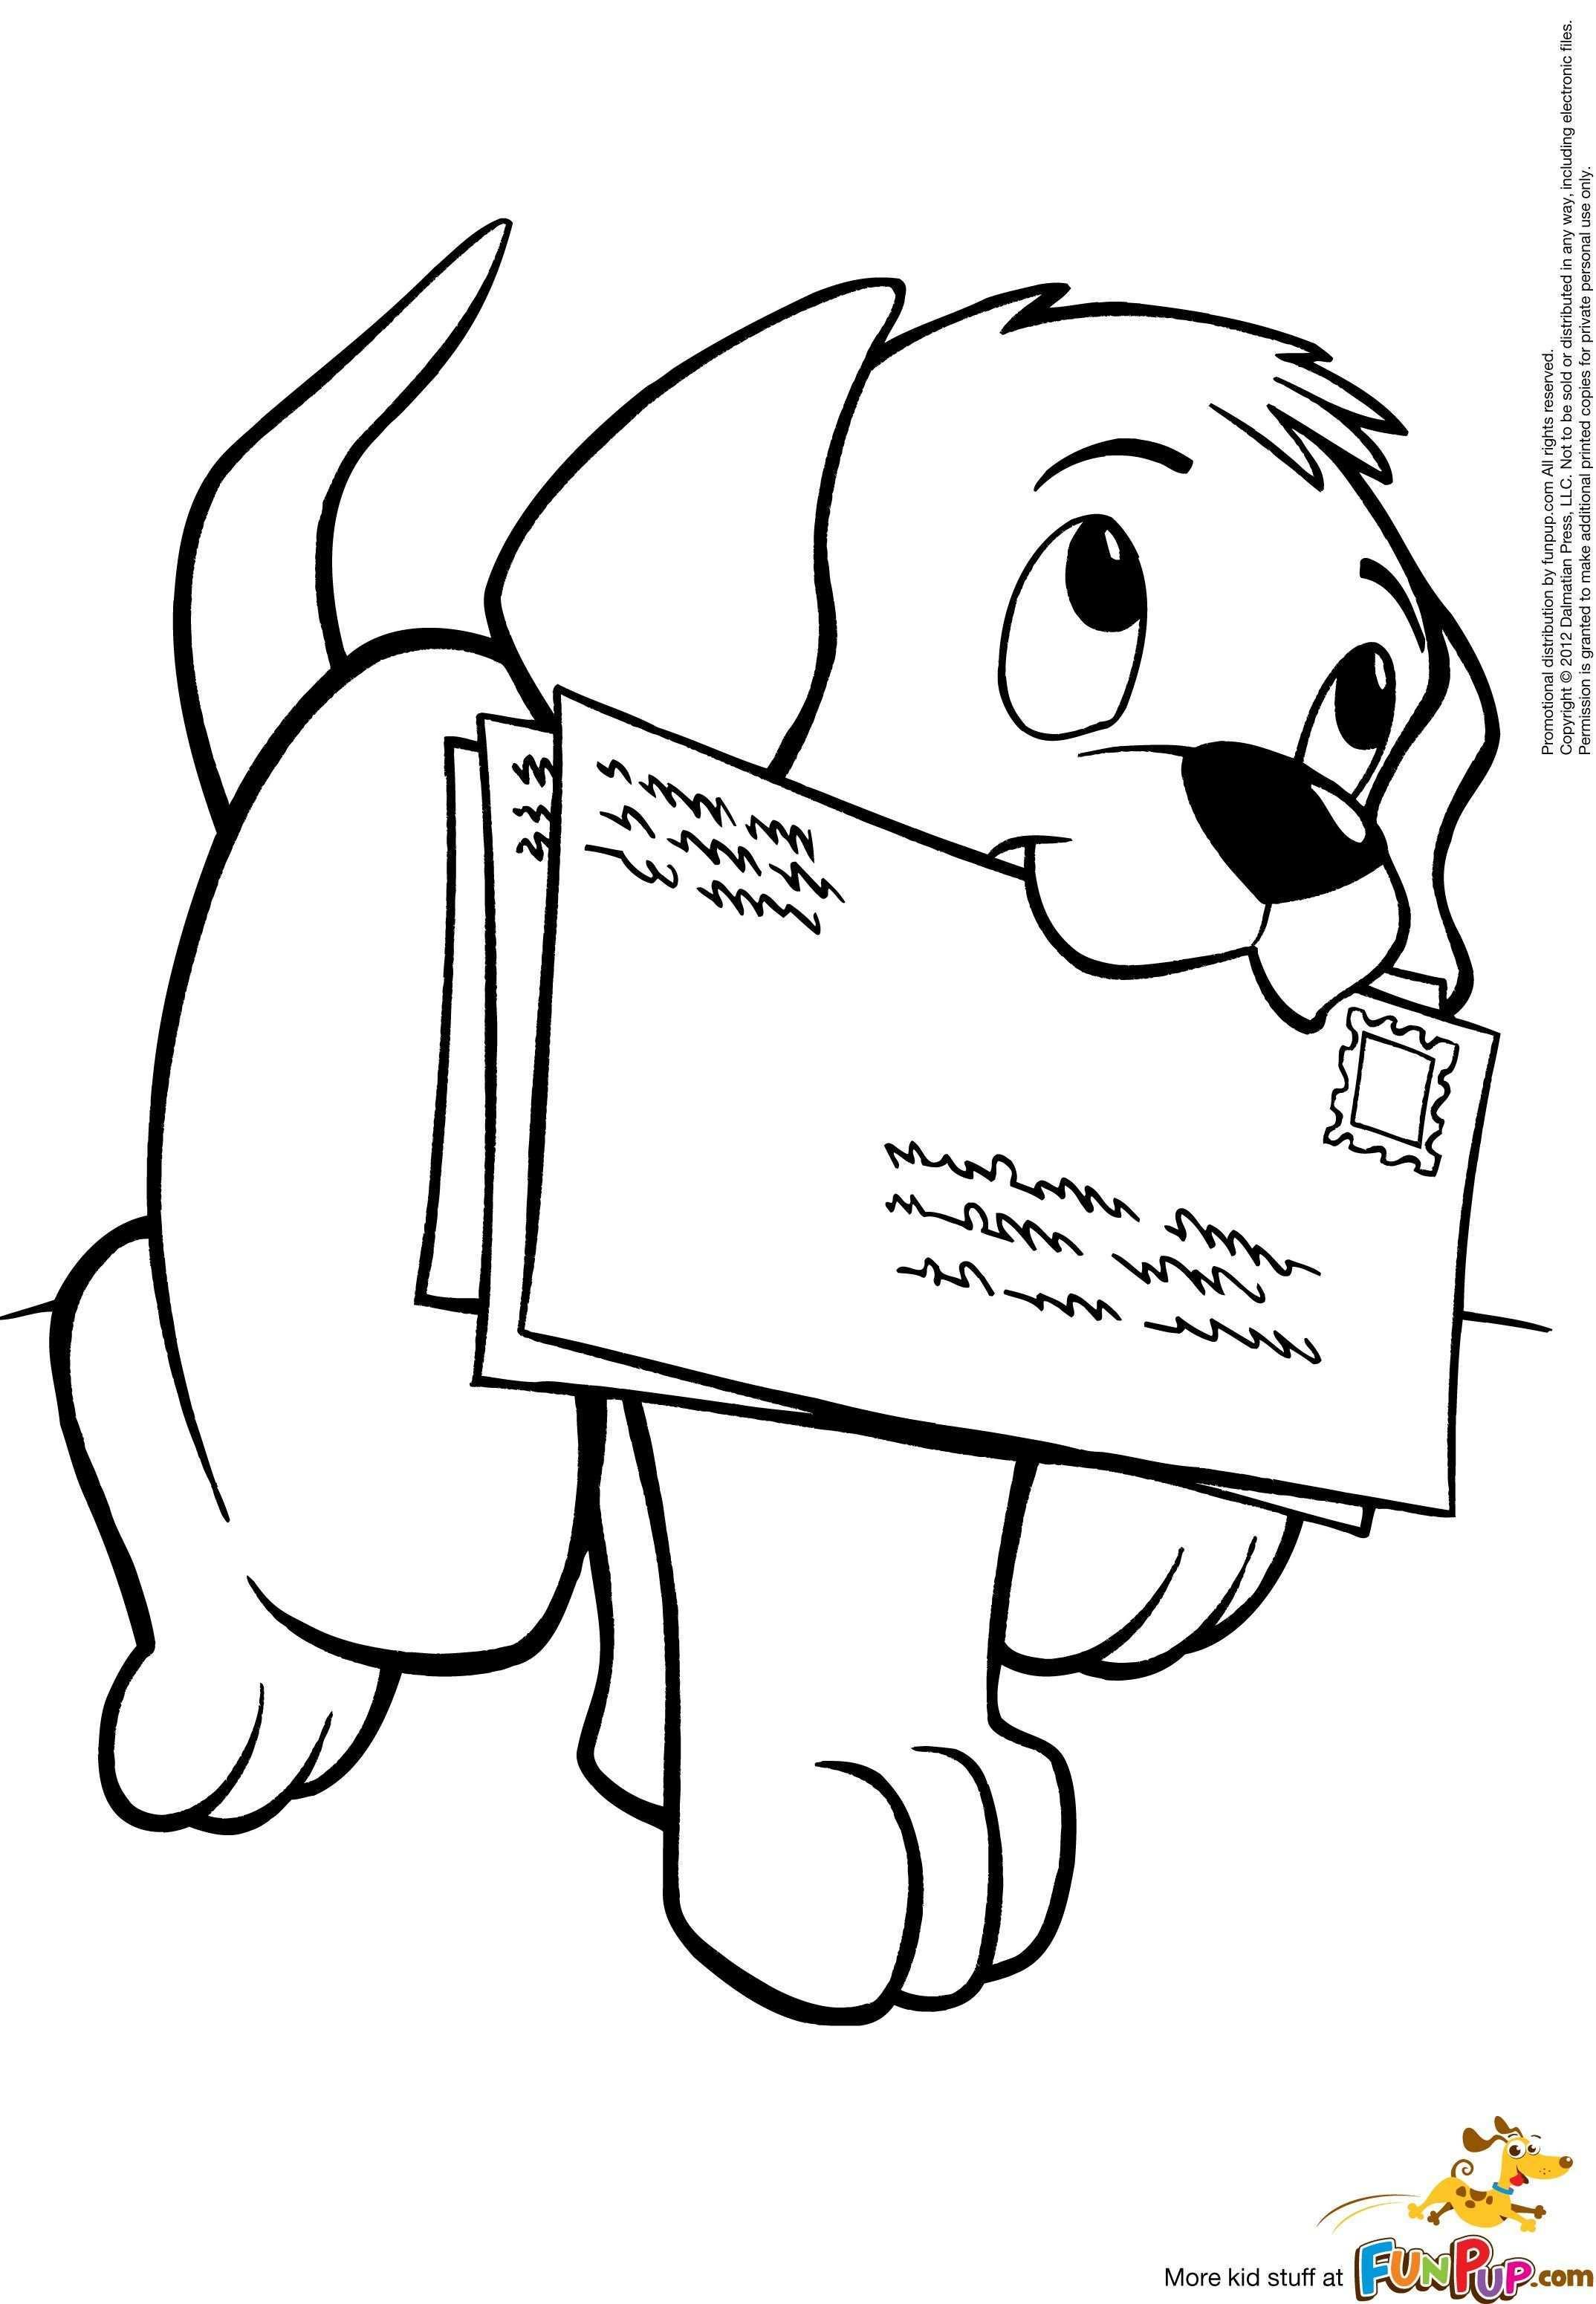 Free Printable Coloring Pages Kleurplaten Disney Kleurplaten Kleurplaten Voor Kinderen